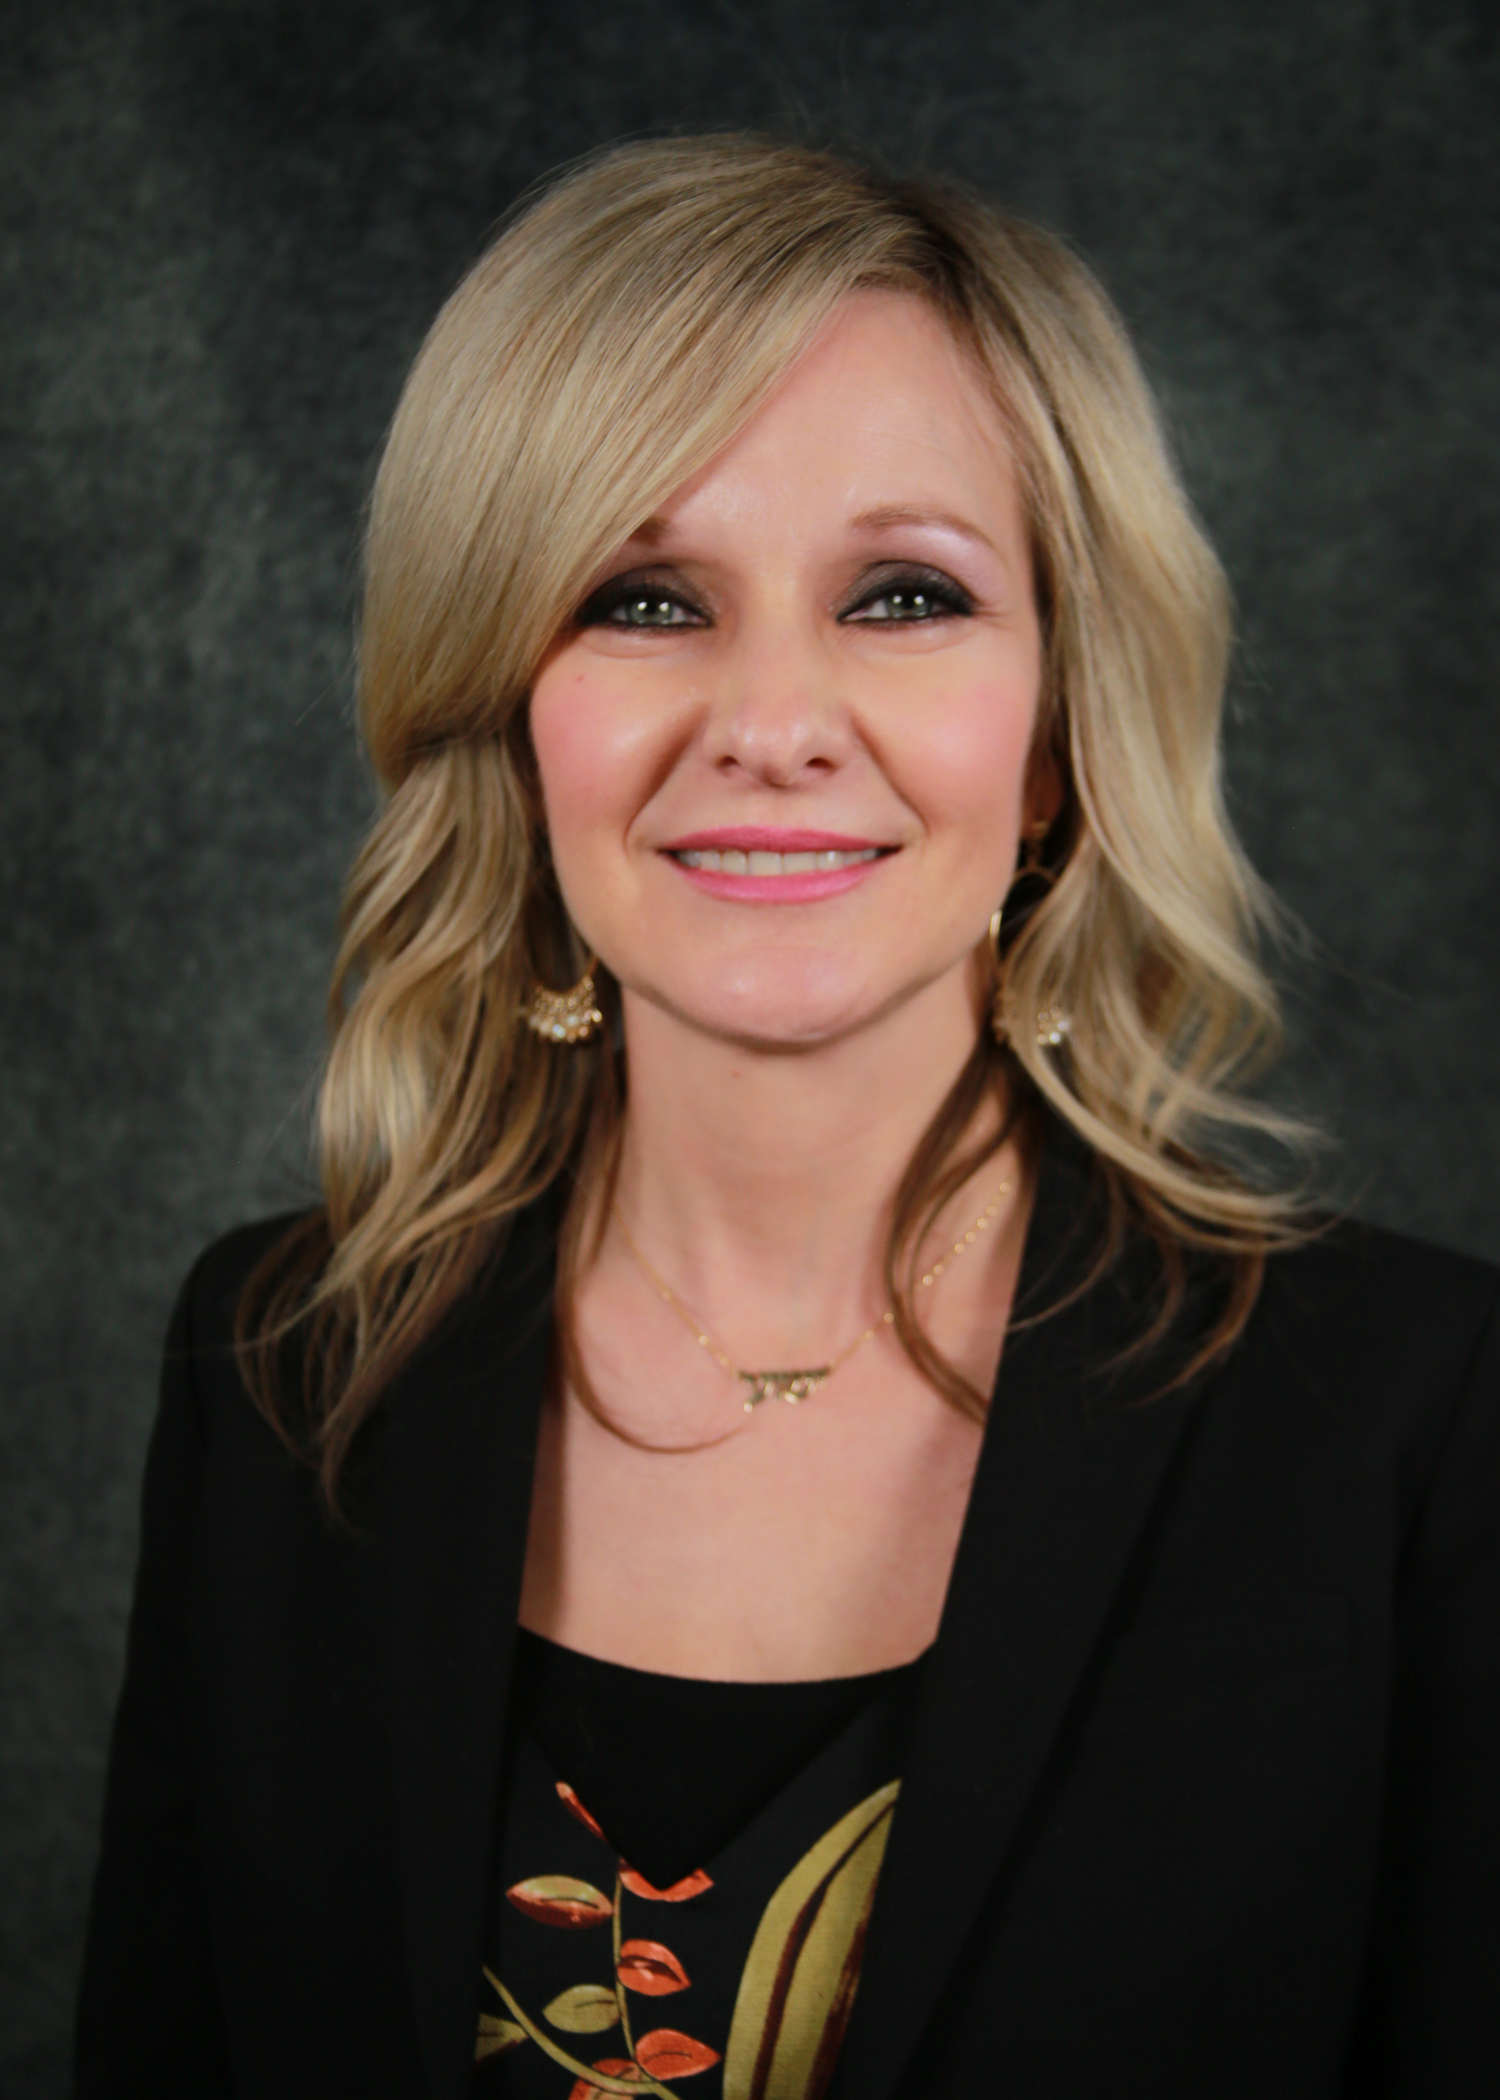 Jaclyn Olsen, CFO of Cogo Capital